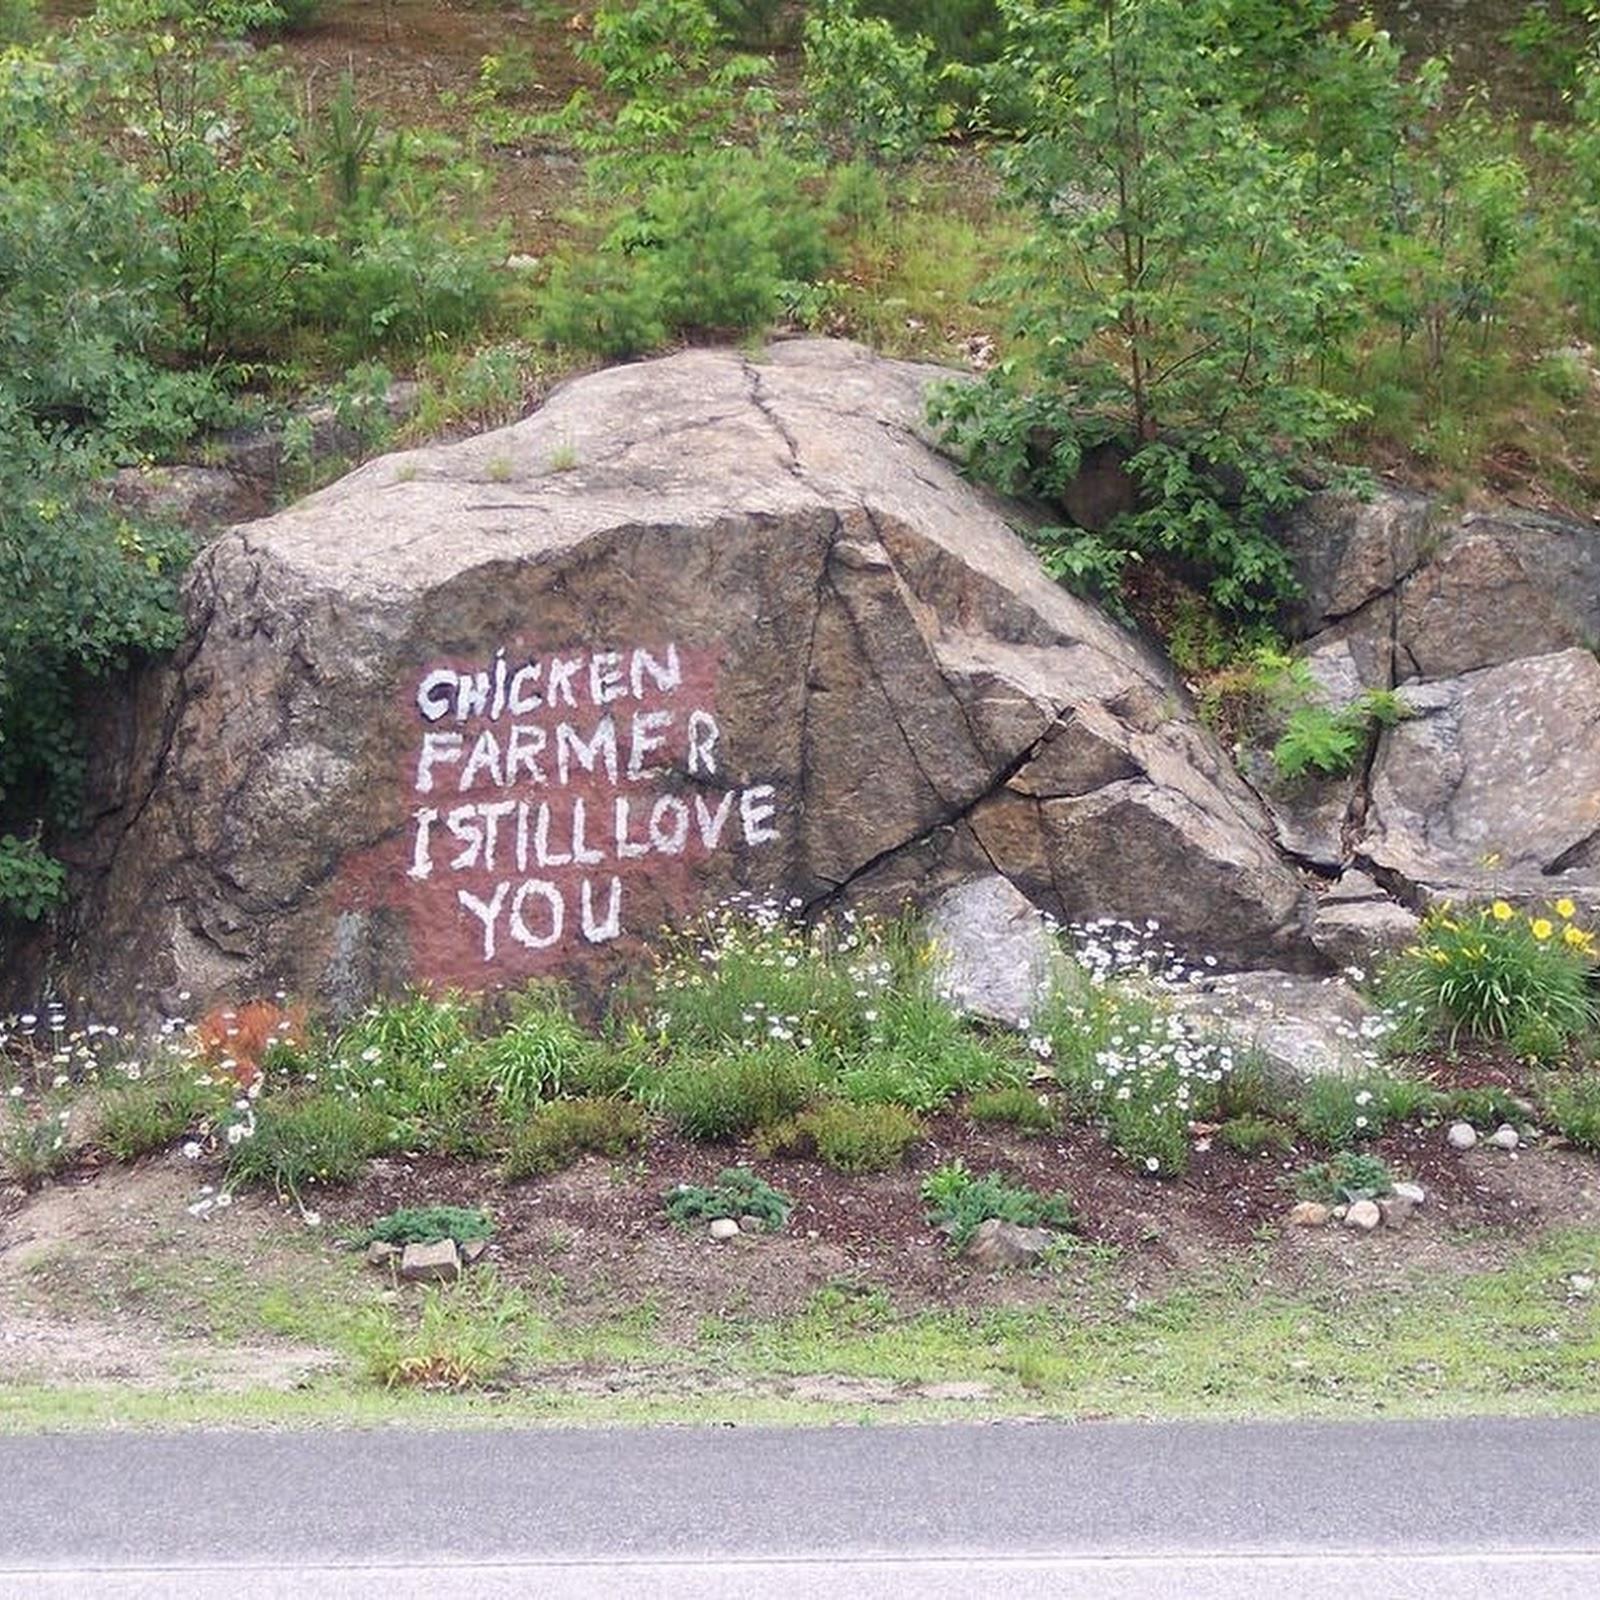 The Romantic Tale Of The Chicken Farmer Rock